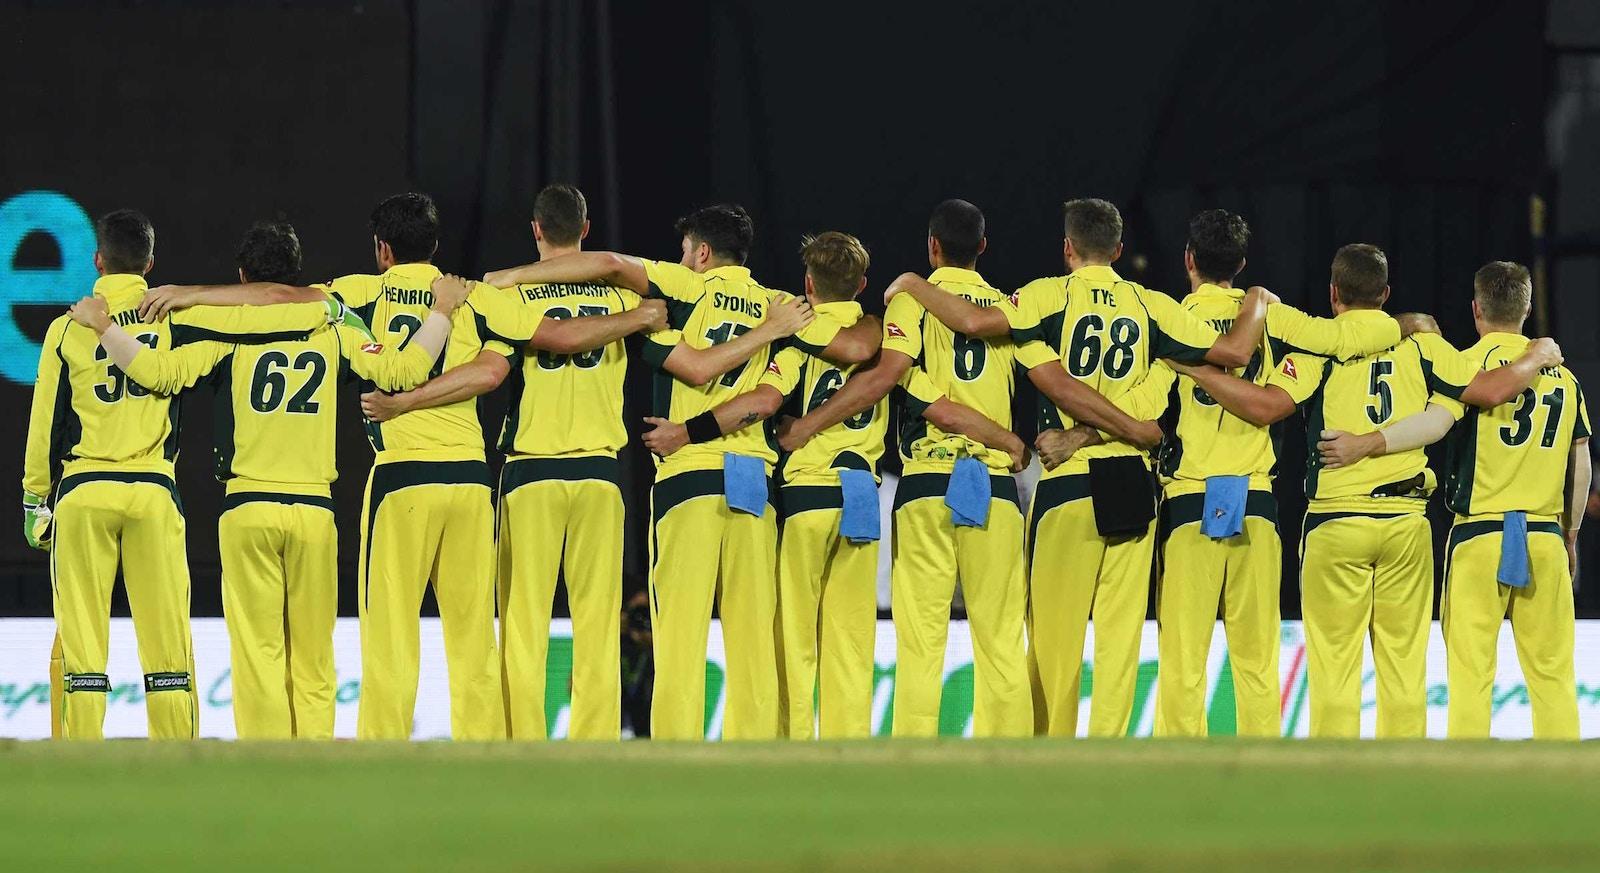 The Summer of Green & Gold - Australia prepare for the ODI & T20 Series